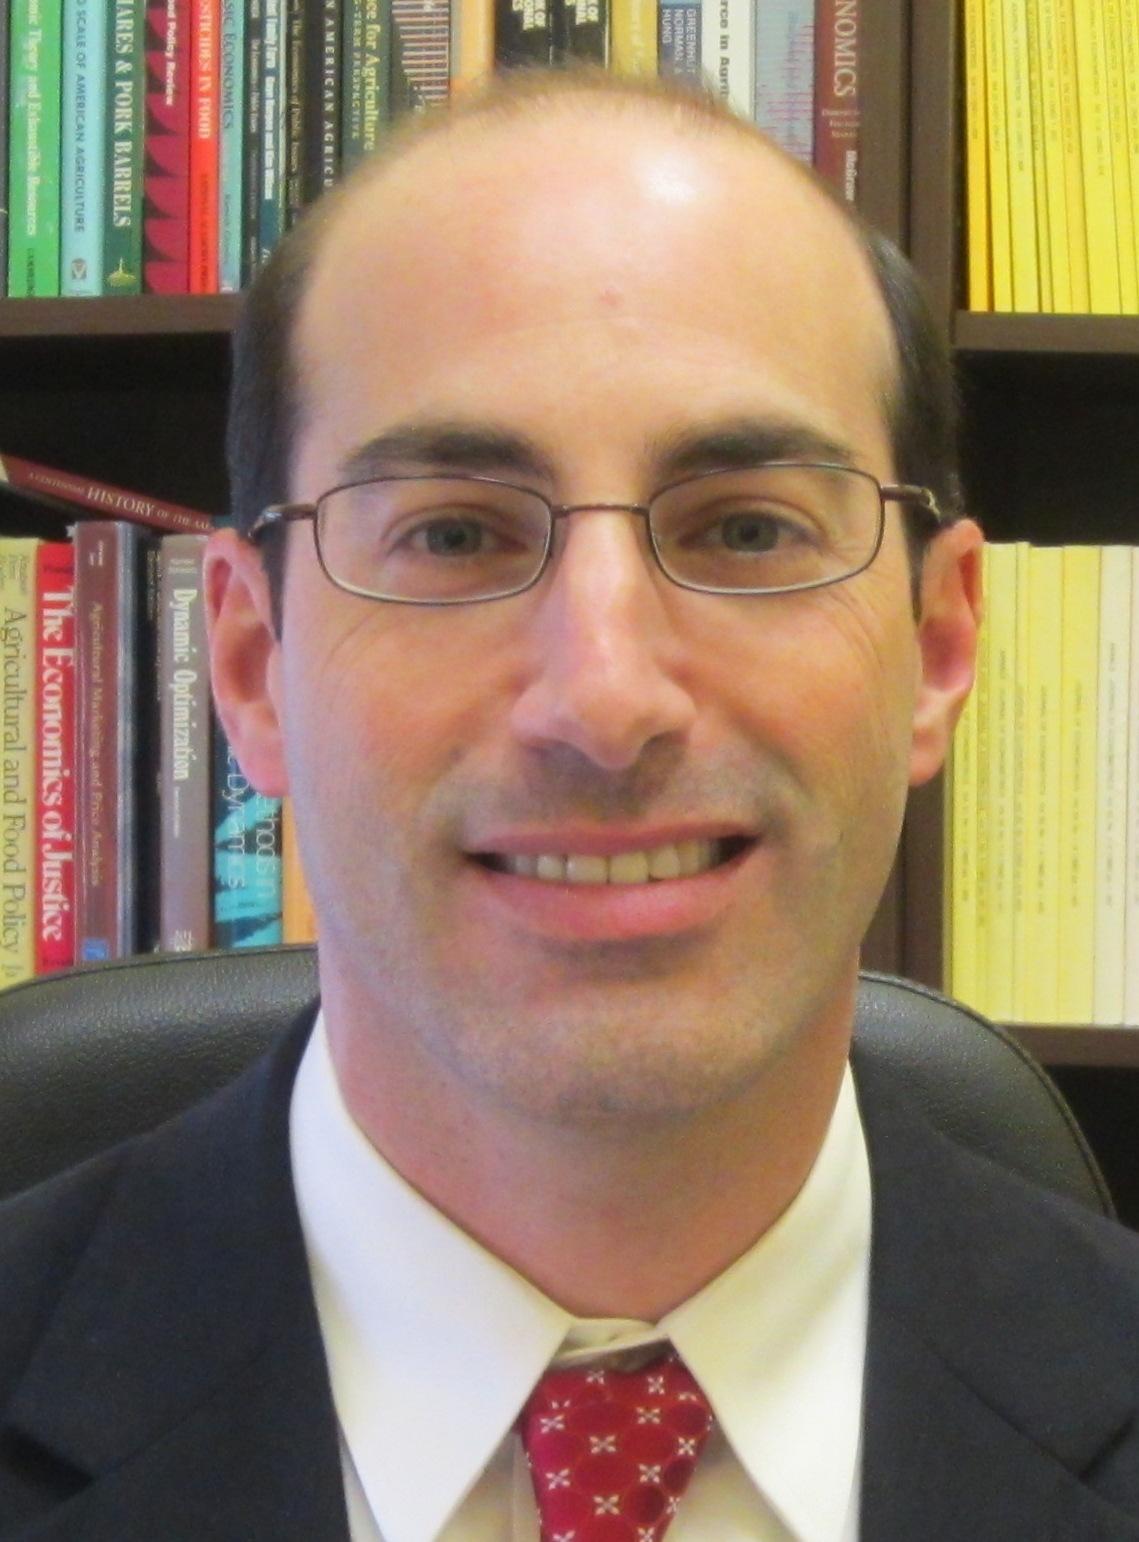 JEFFREY DORFMAN Professor of Applied Economics University of Georgia